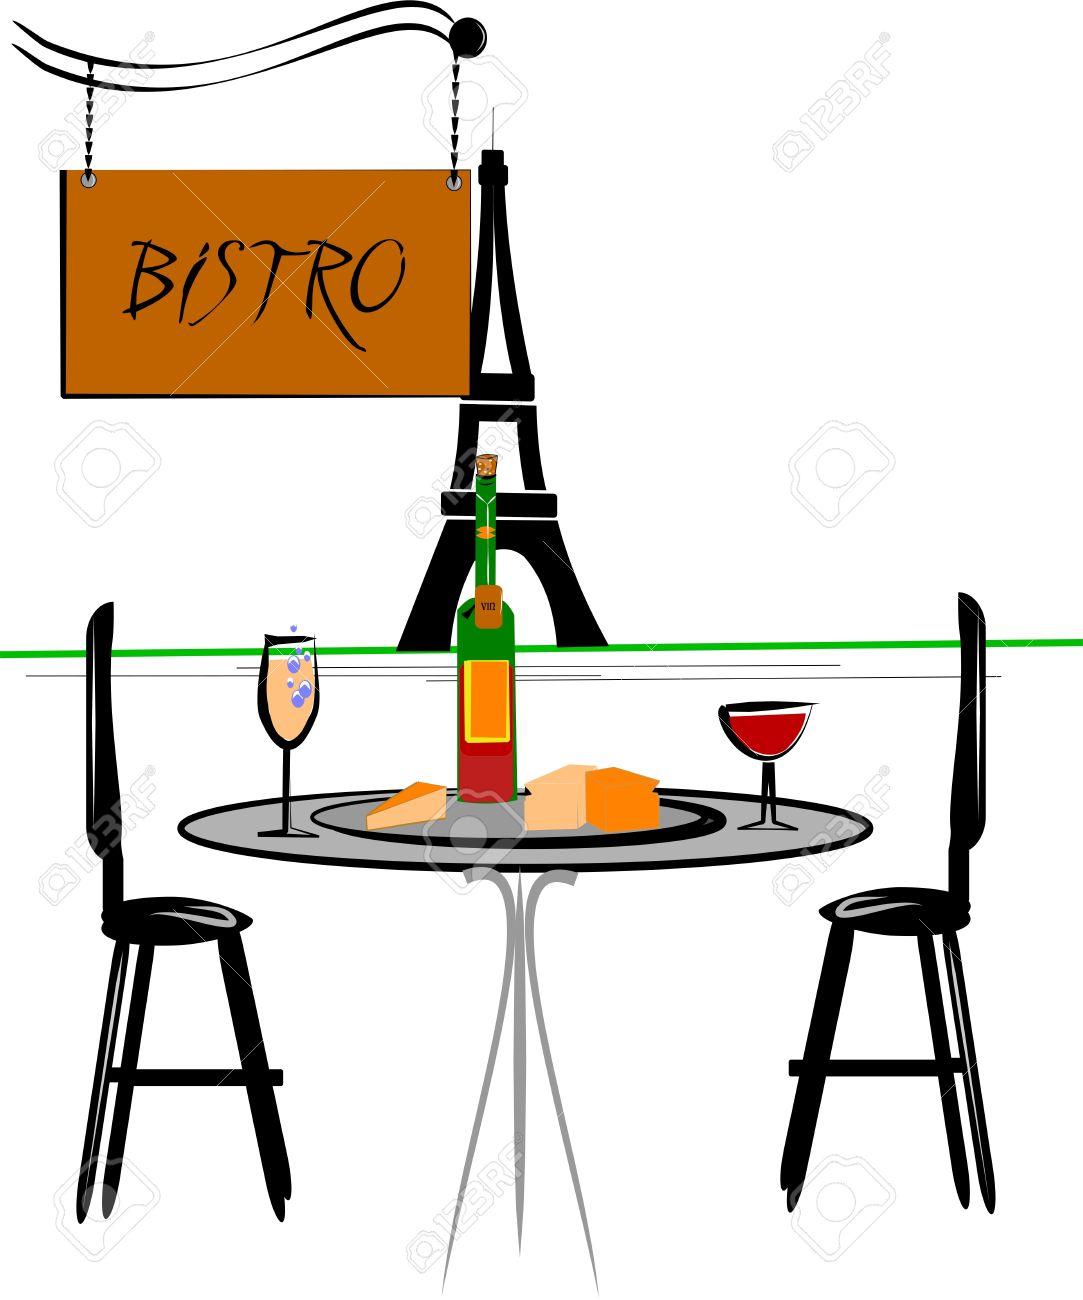 Bistro . Cafe clipart restaurant french